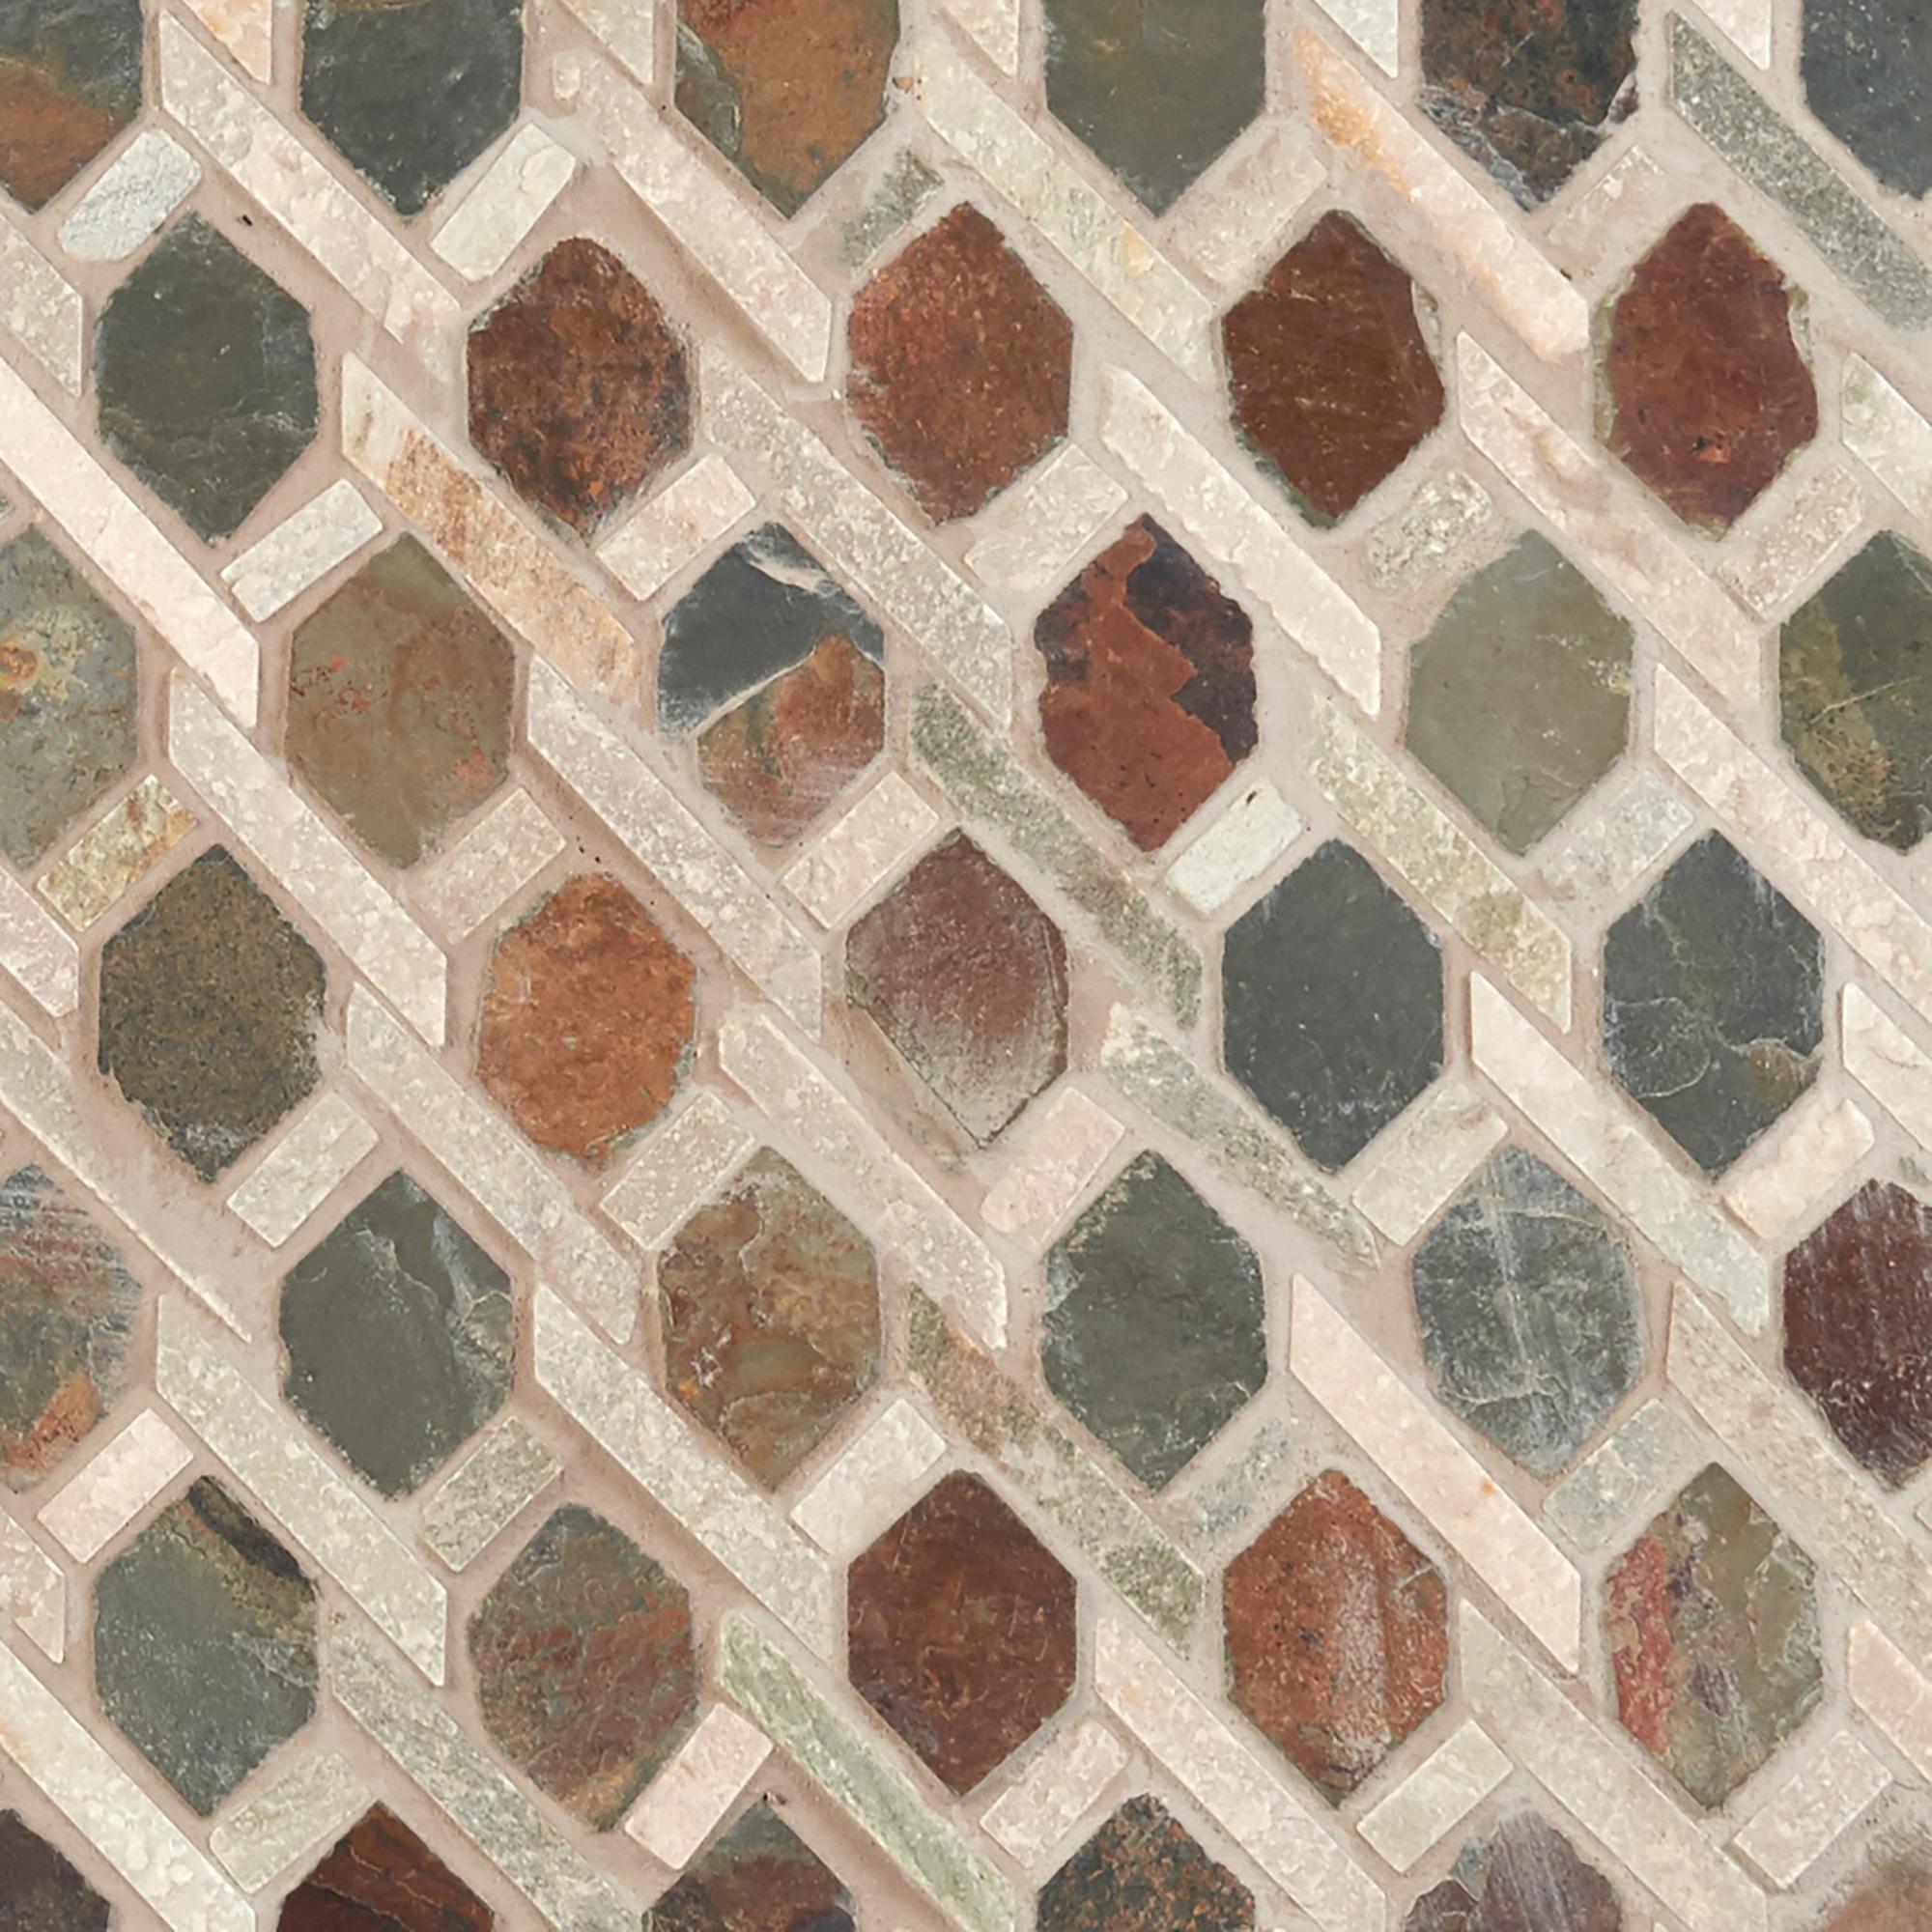 Decorative Slate Tiles Mixed Diamond Decorative Slate Mosaic  Slate Mosaics And Natural